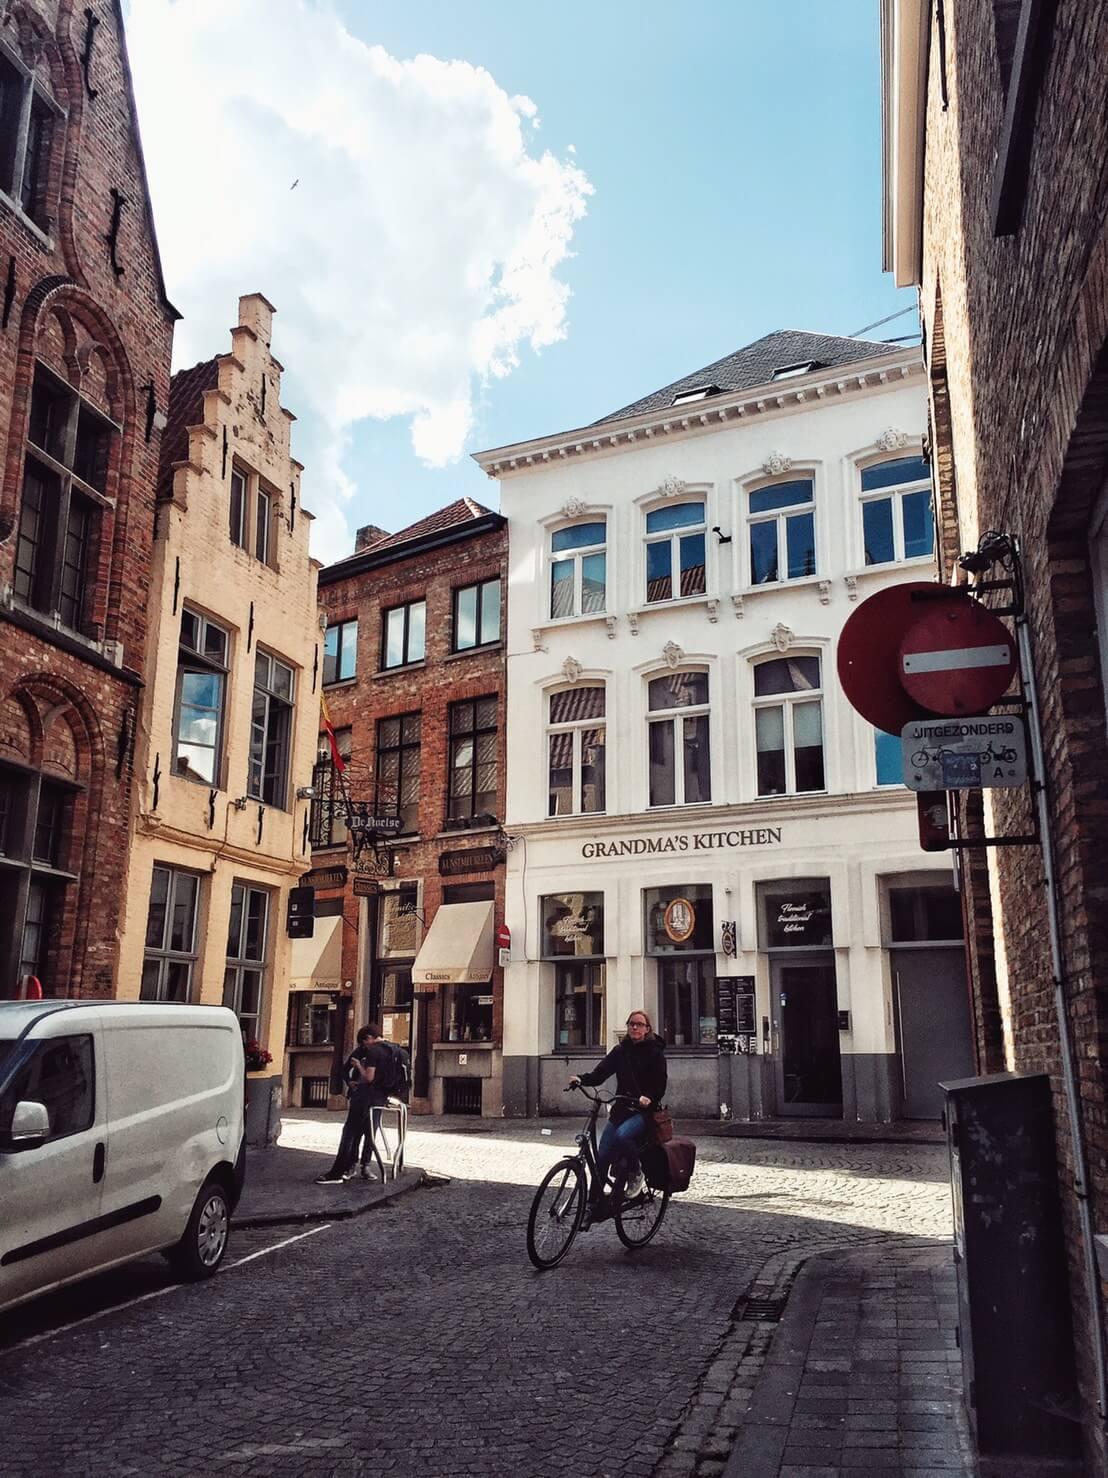 [ Belgium ] 比利時八天城市流浪, Train Hostel便宜青年旅館推薦!(2021)